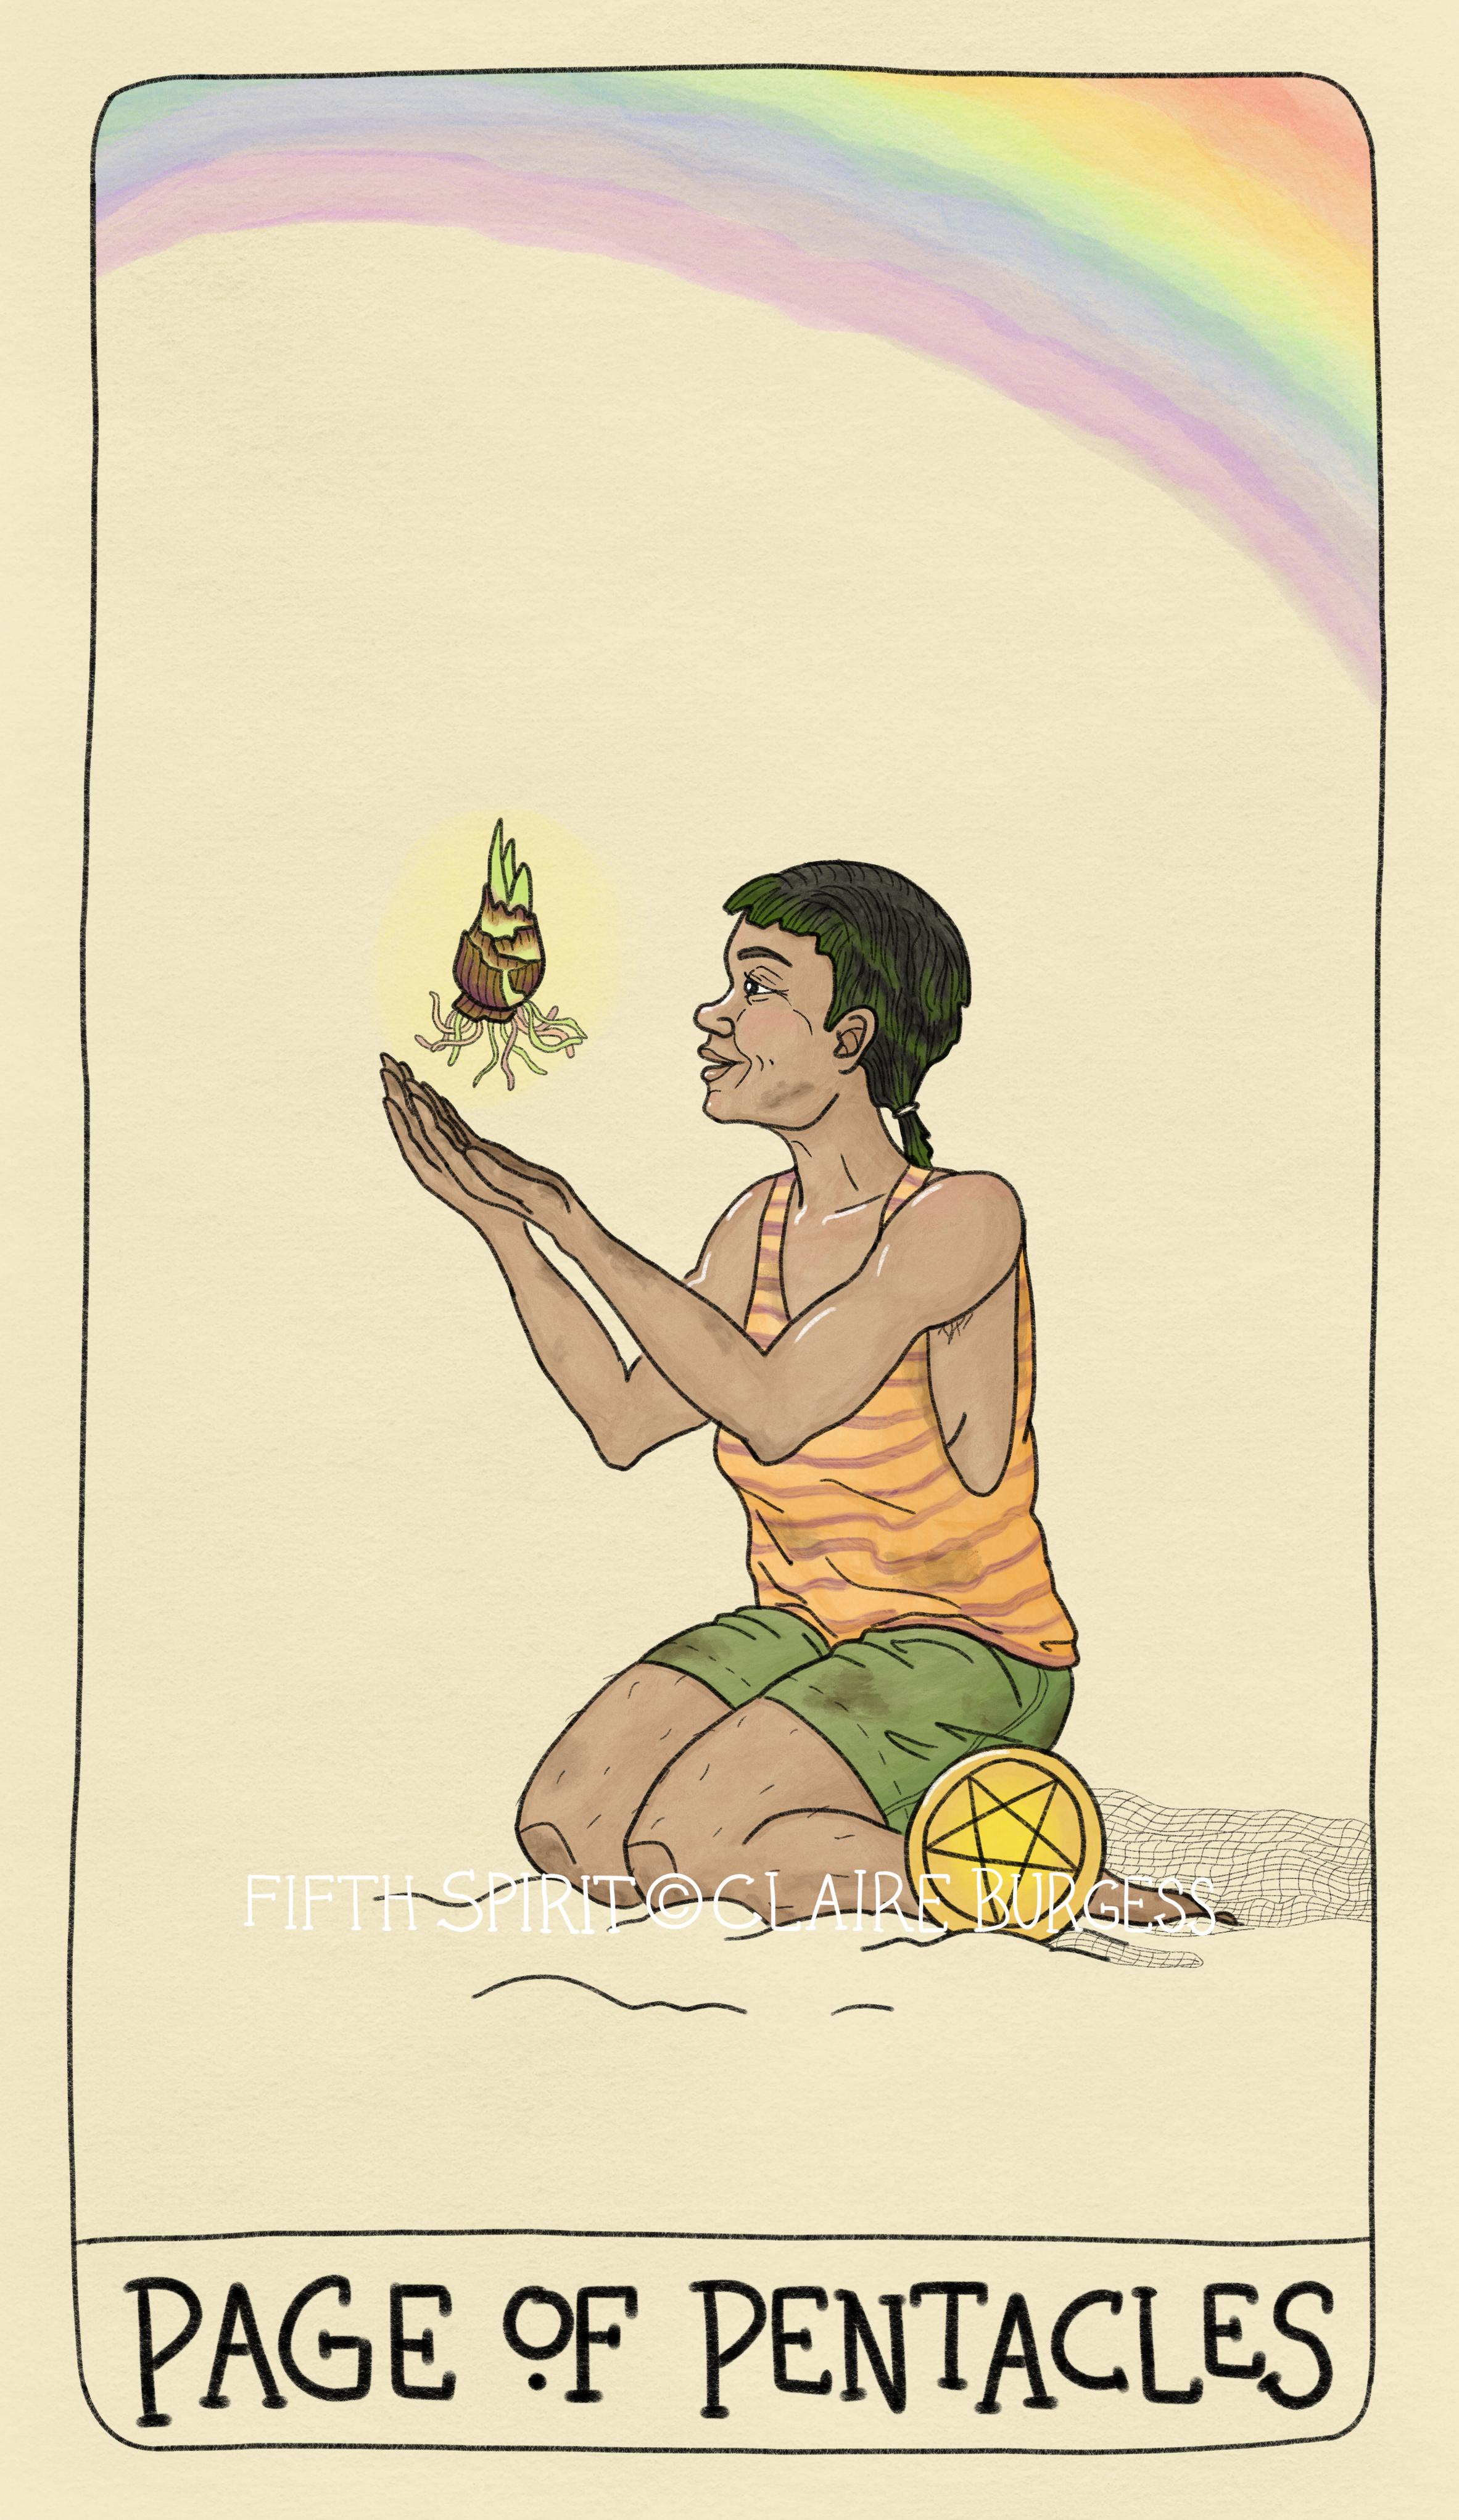 Page of Pentacles Fifth Spirit Tarot